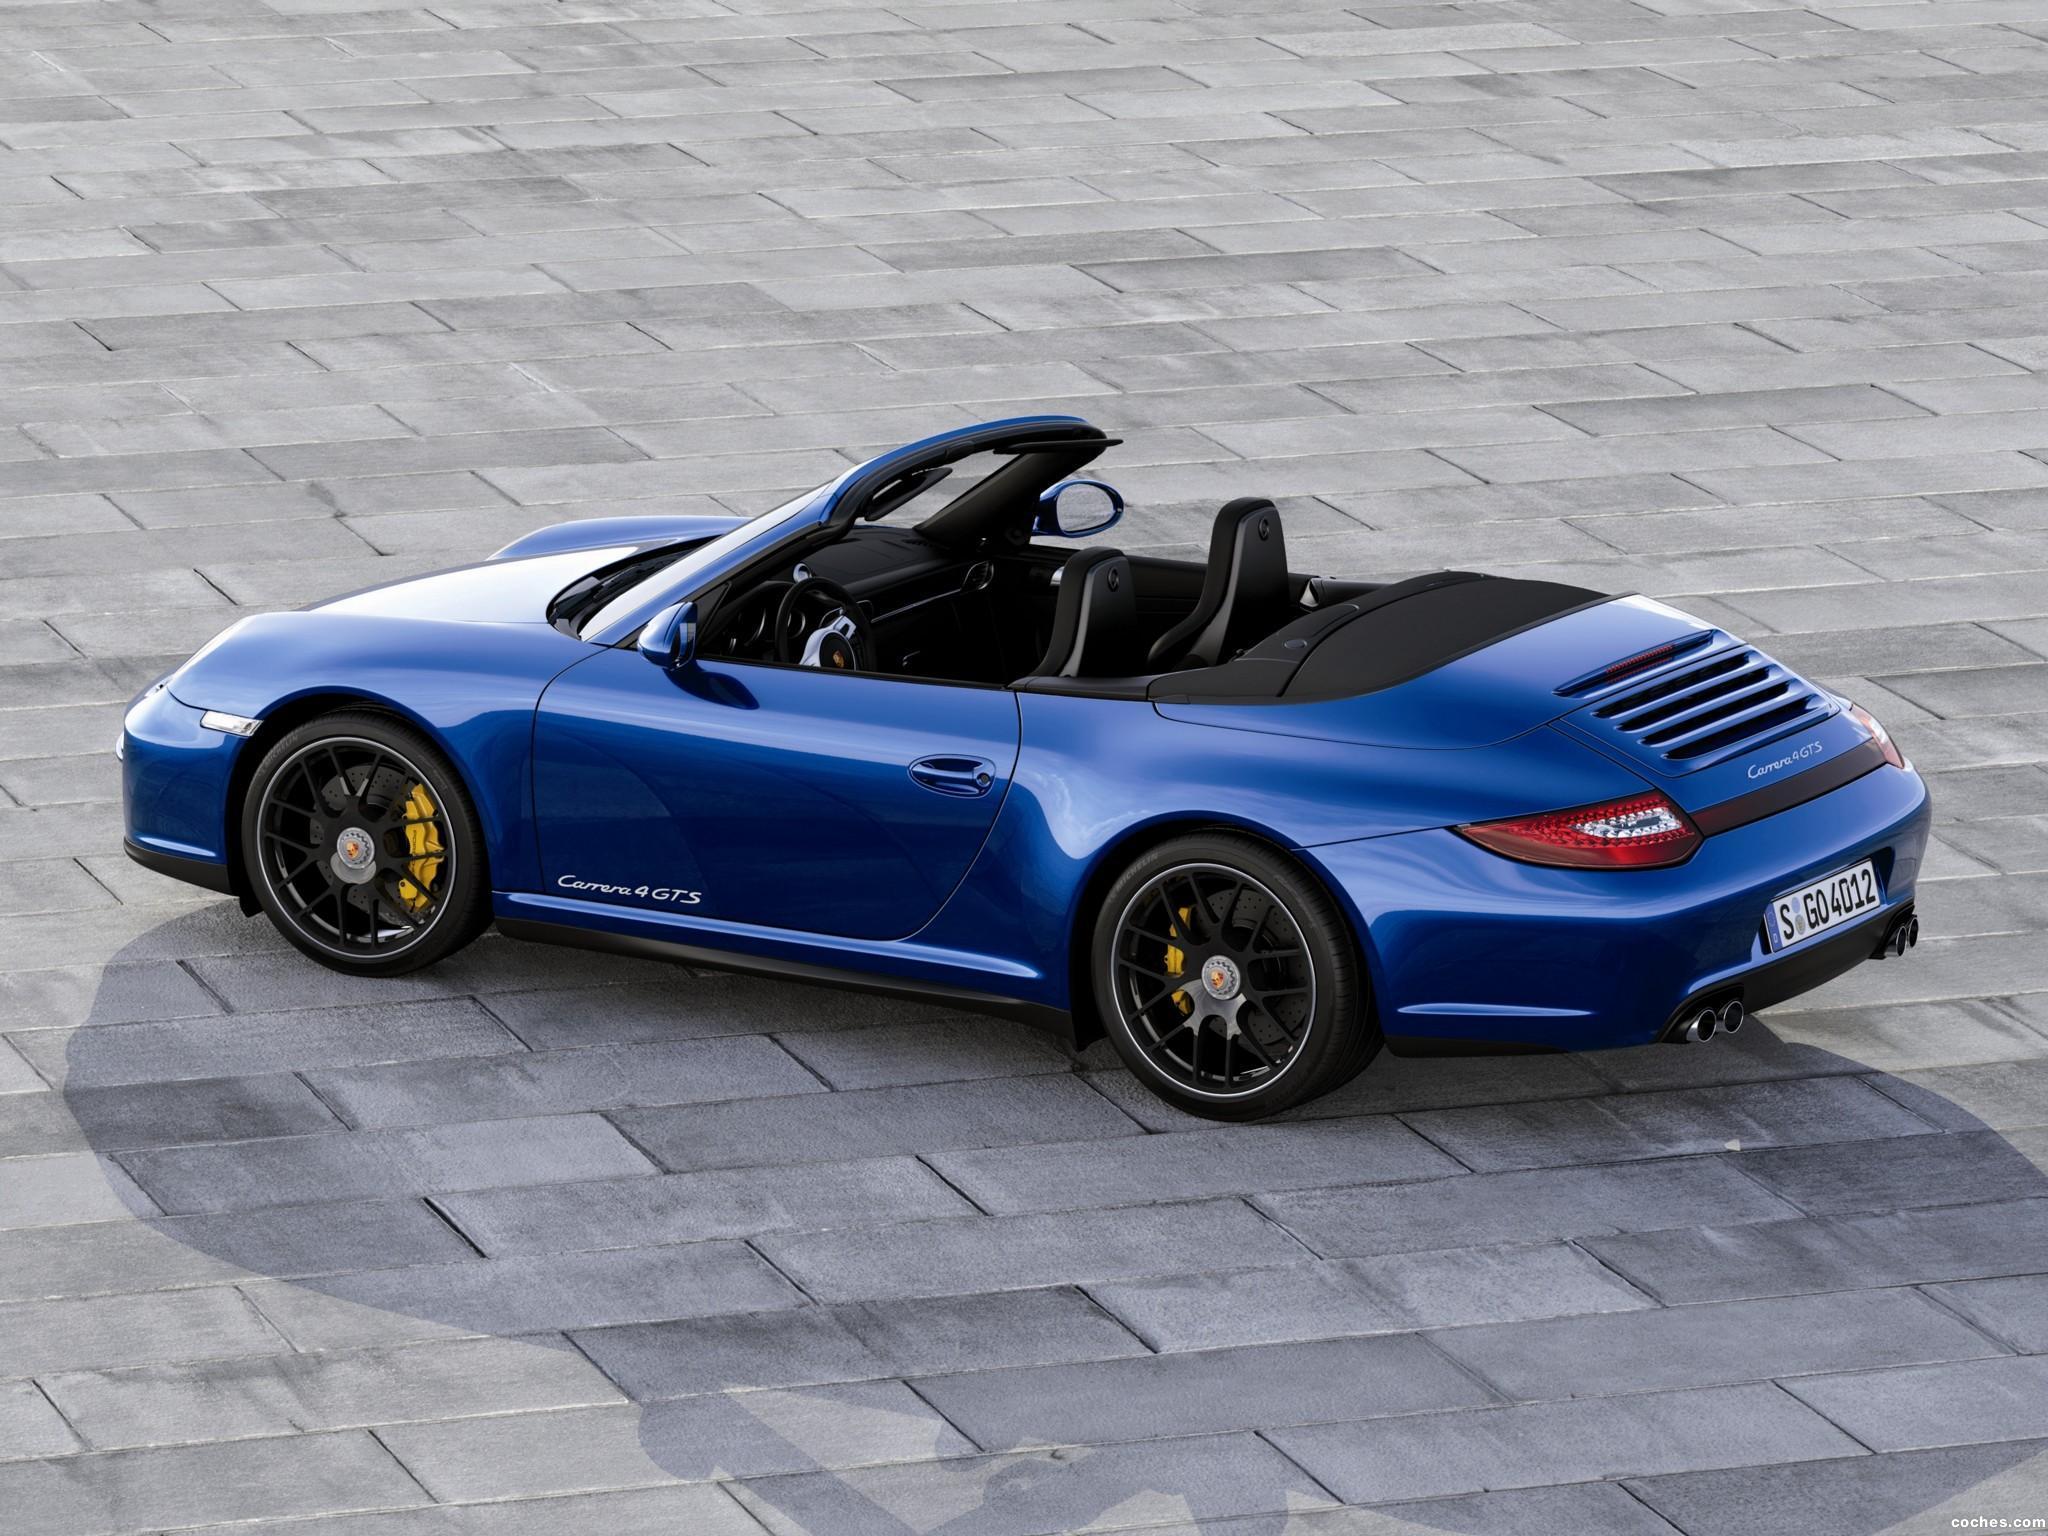 Foto 4 de Porsche 911 Carrera 4 GTS Cabriolet 997 2011